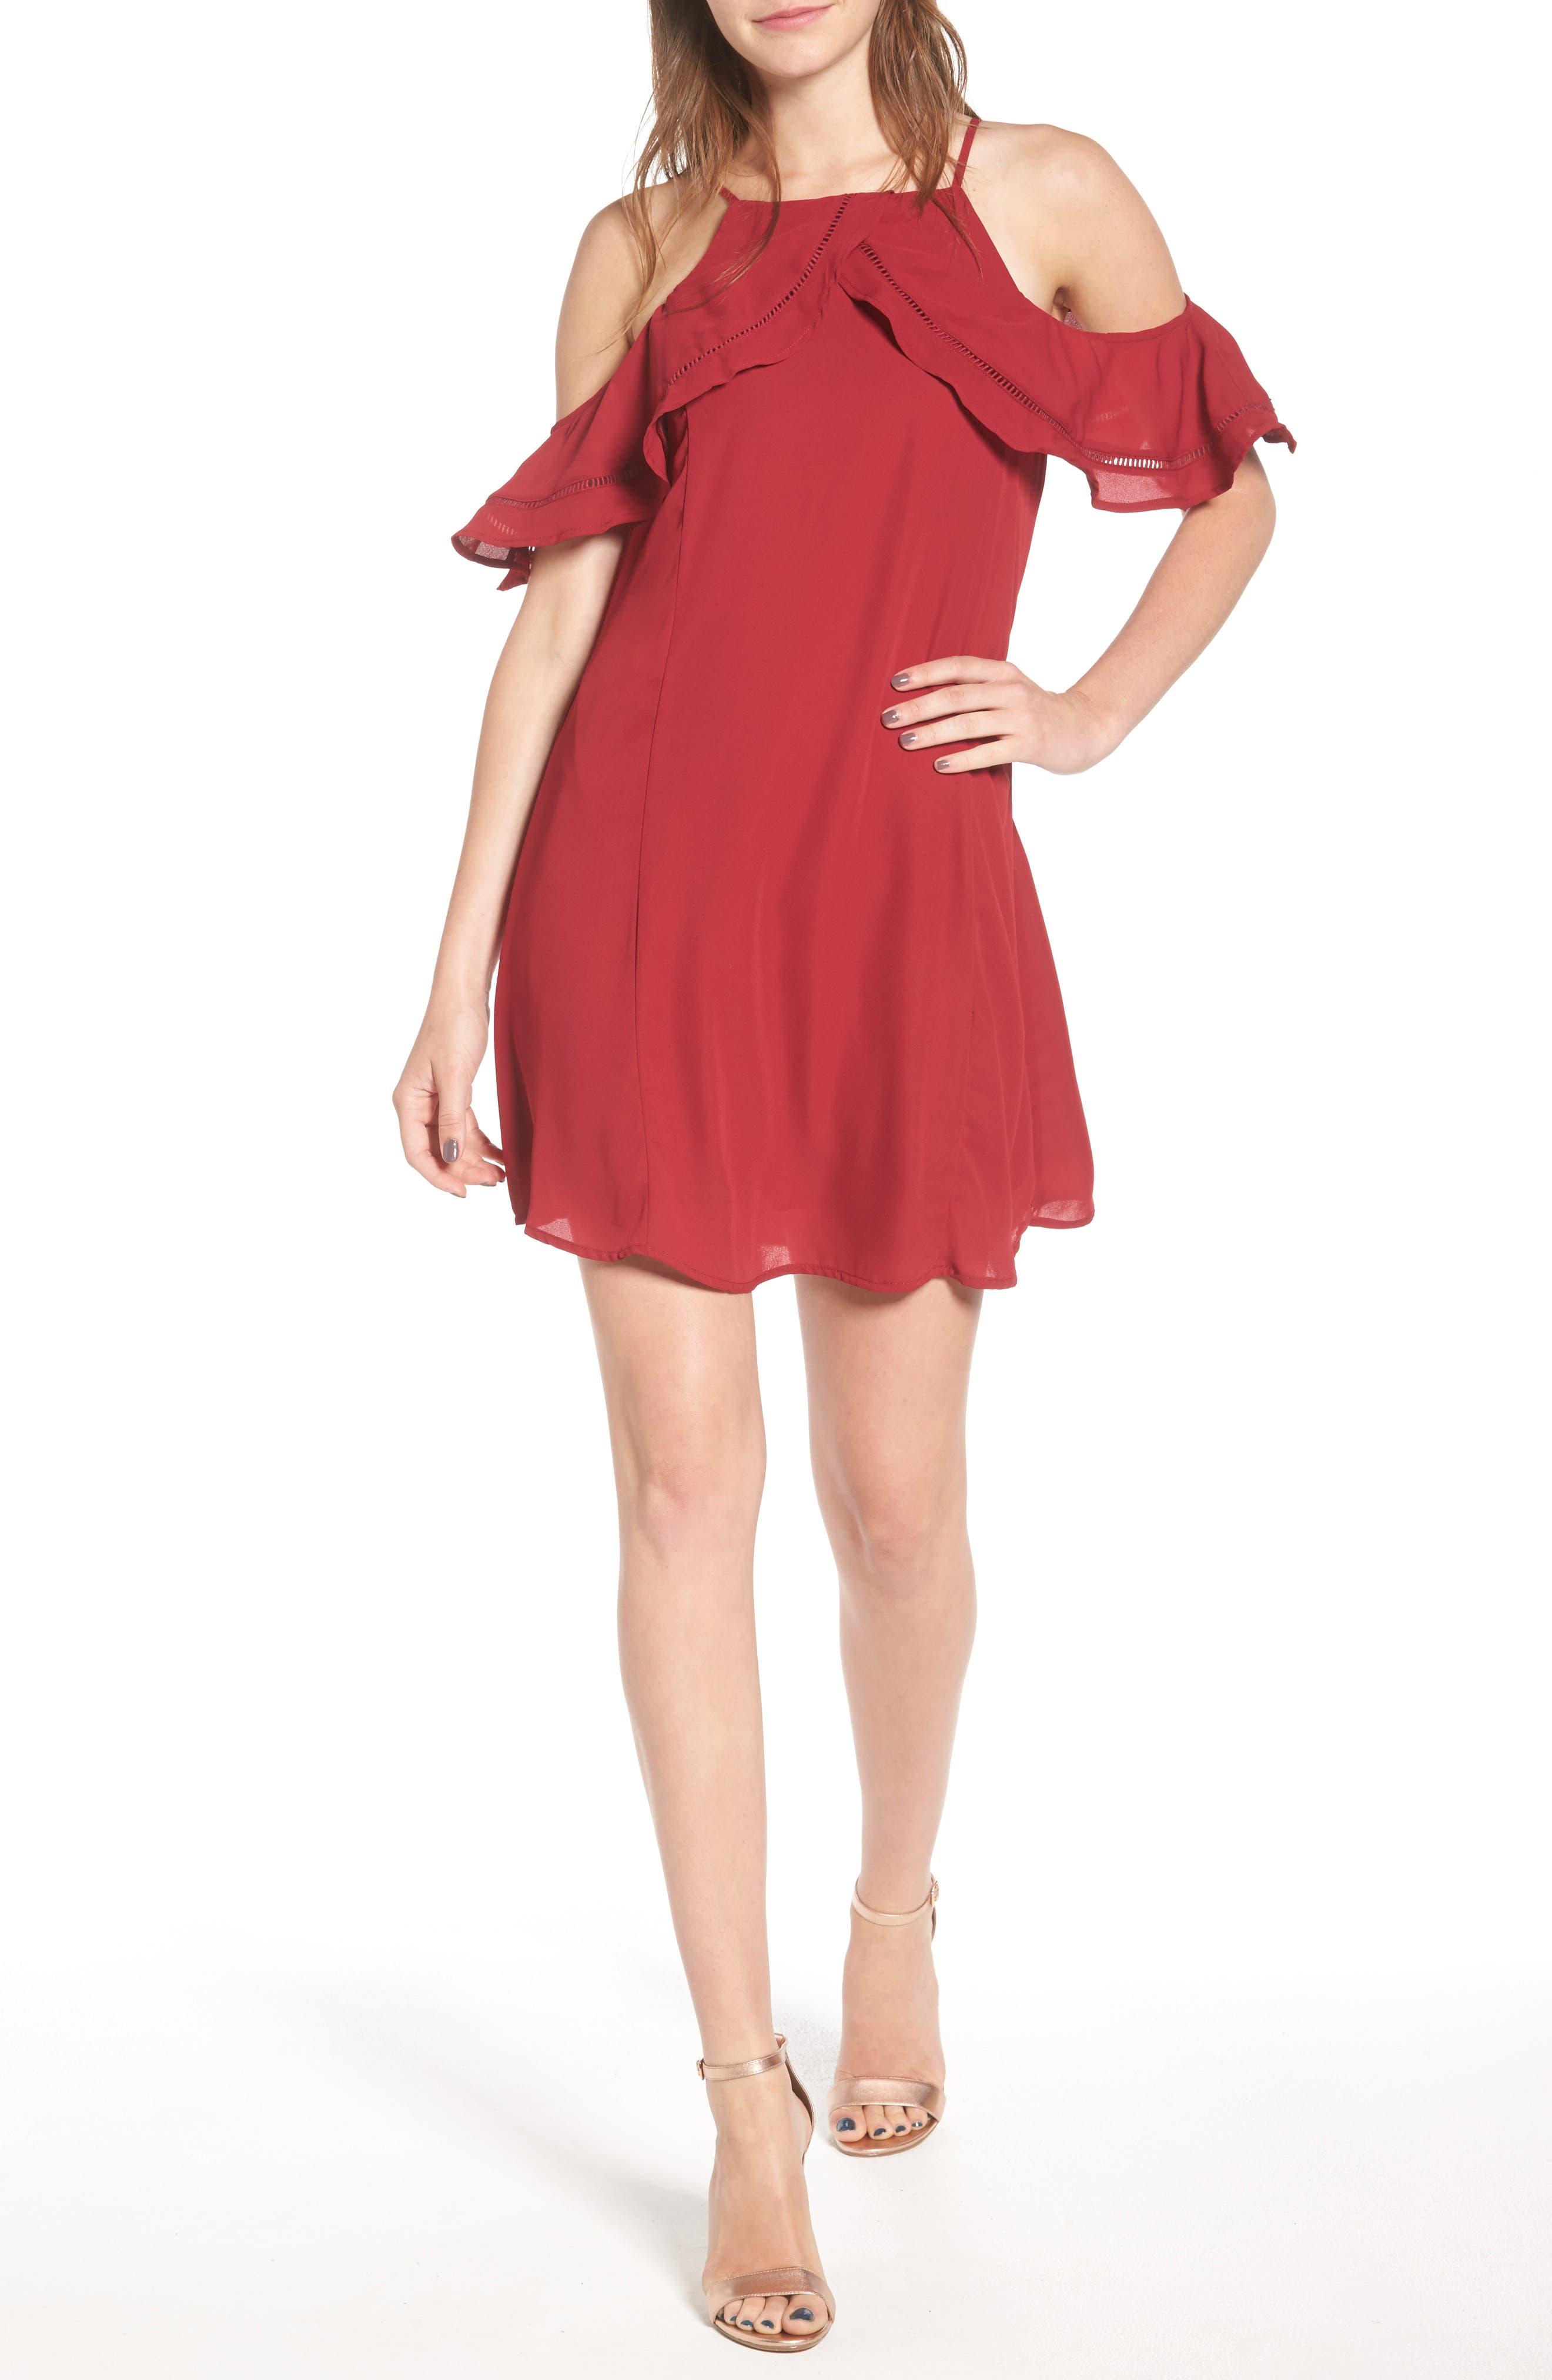 DEE ELLY Ruffle Cold Shoulder Dress